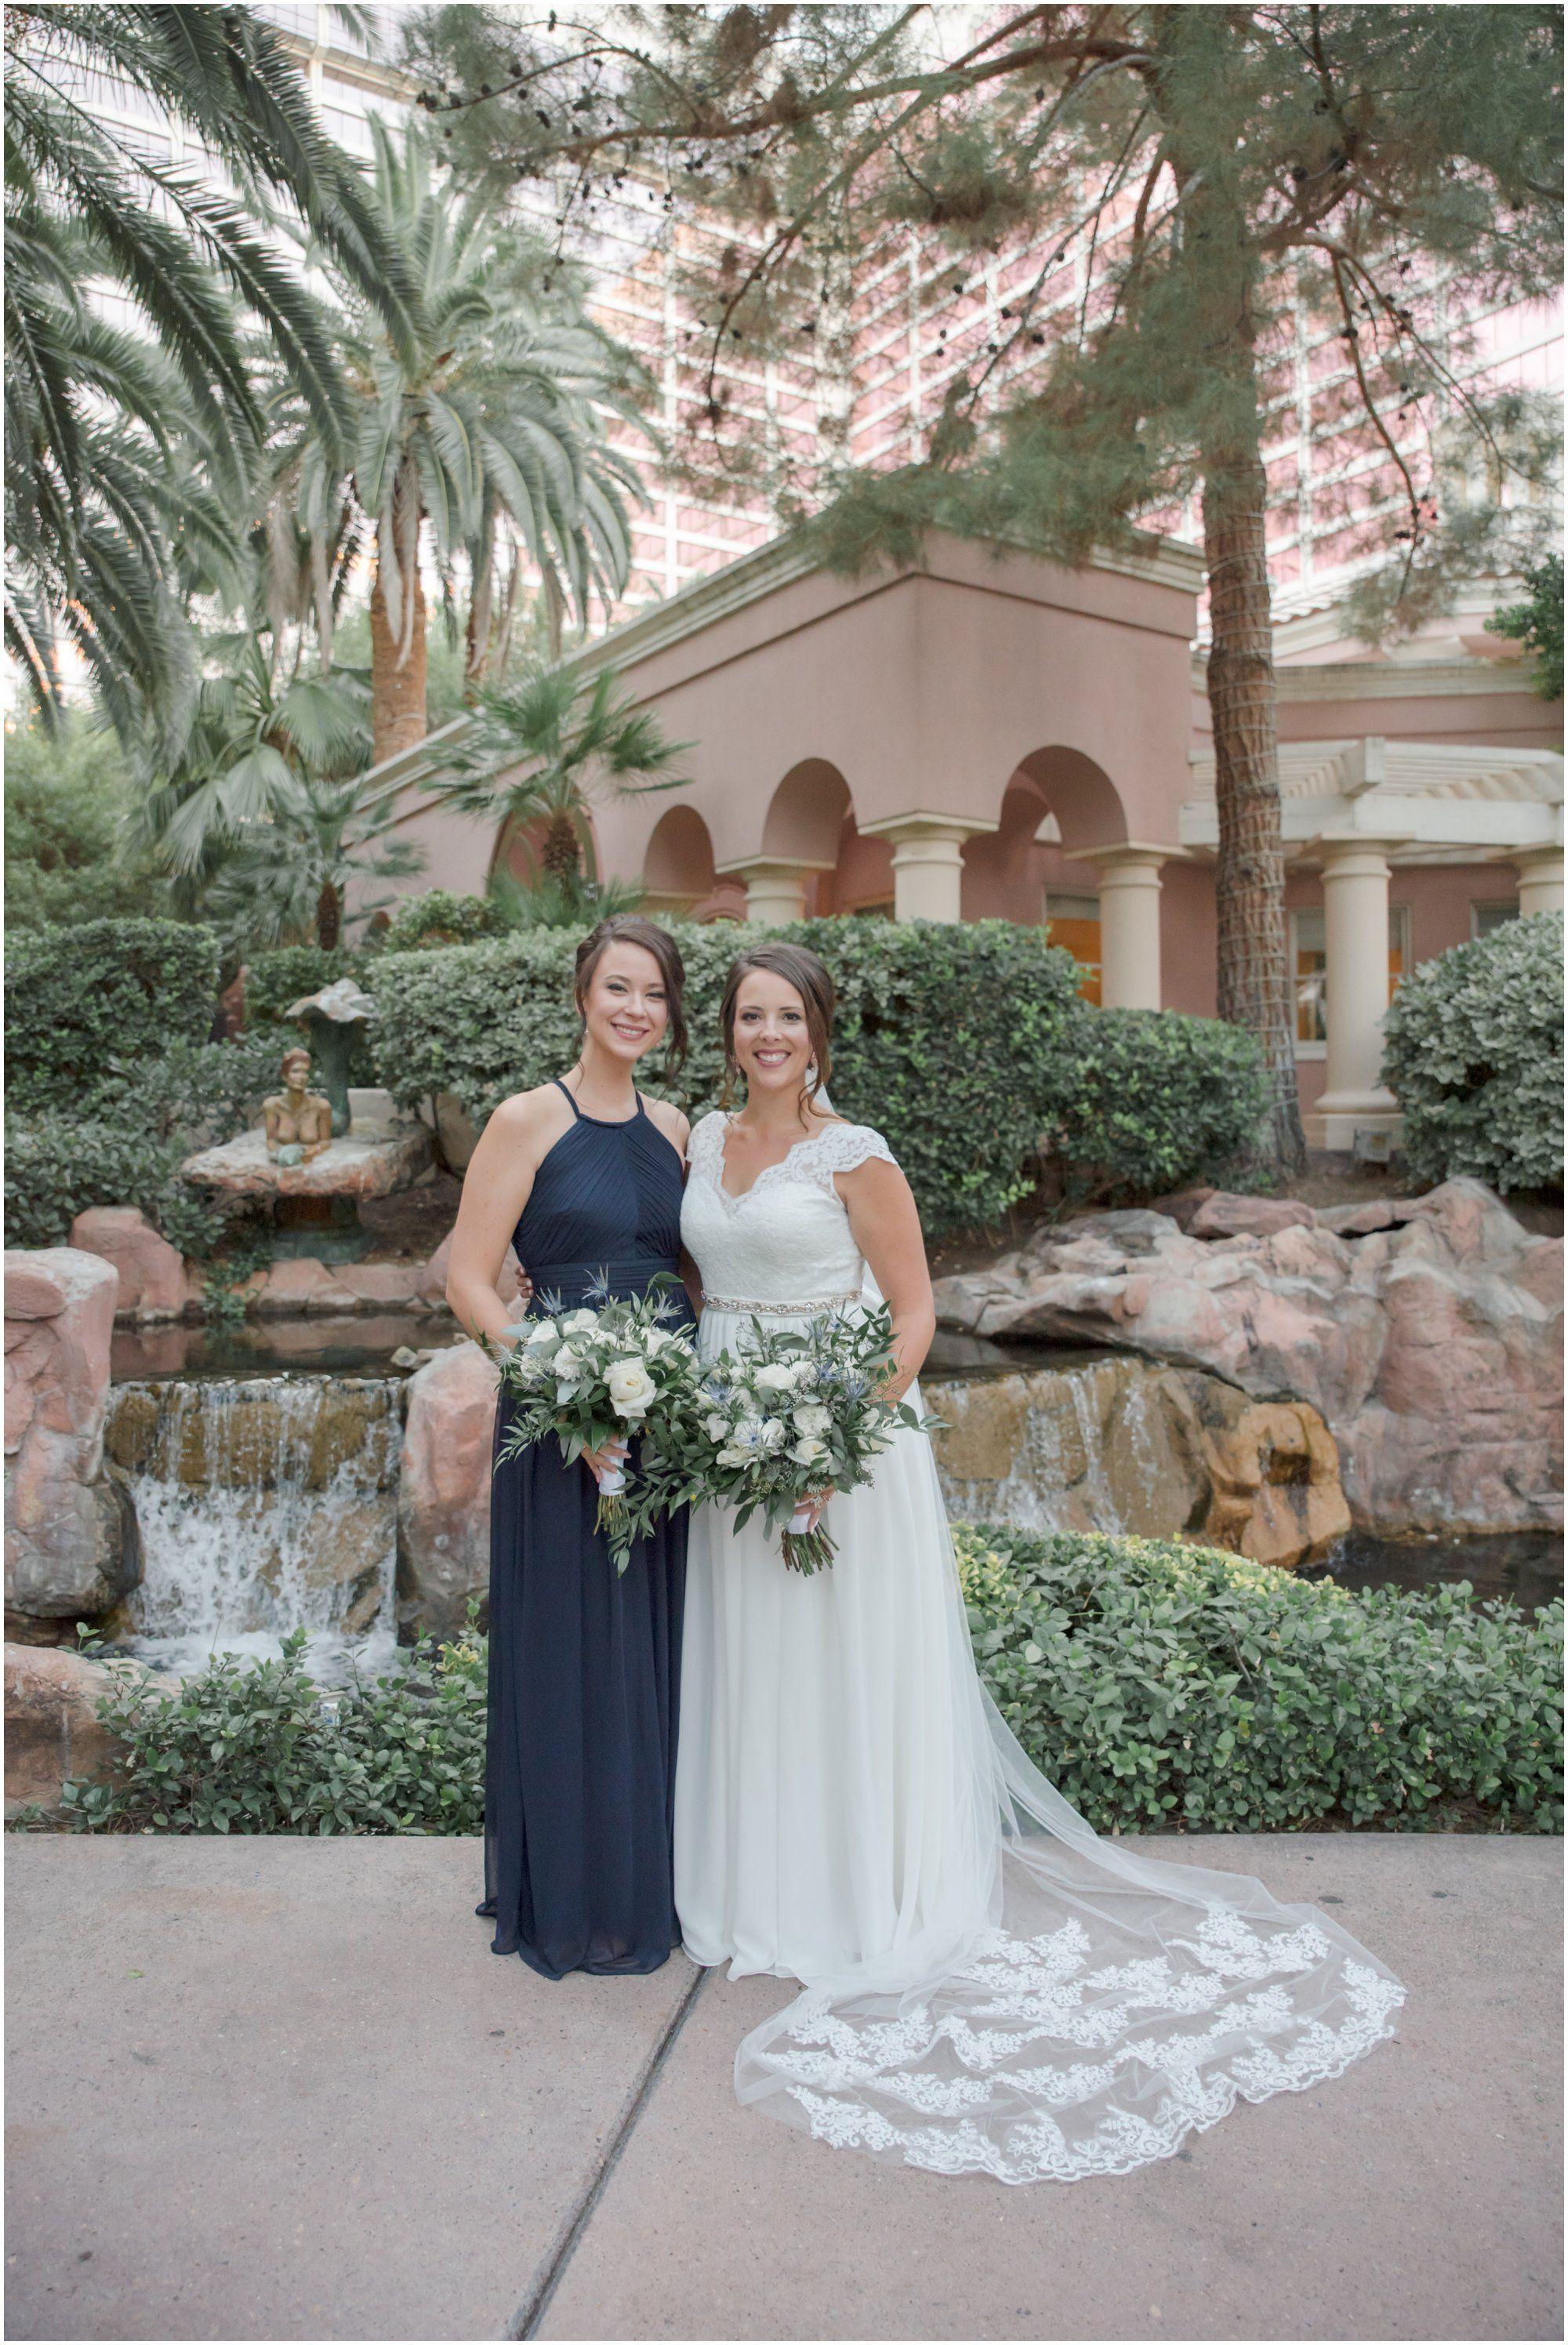 The Flamingo Hotel Casino Las Vegas Nevada Flamingo Hotel Casino Wedding Flamin Conservative Wedding Dress Outdoor Las Vegas Wedding Casino Wedding